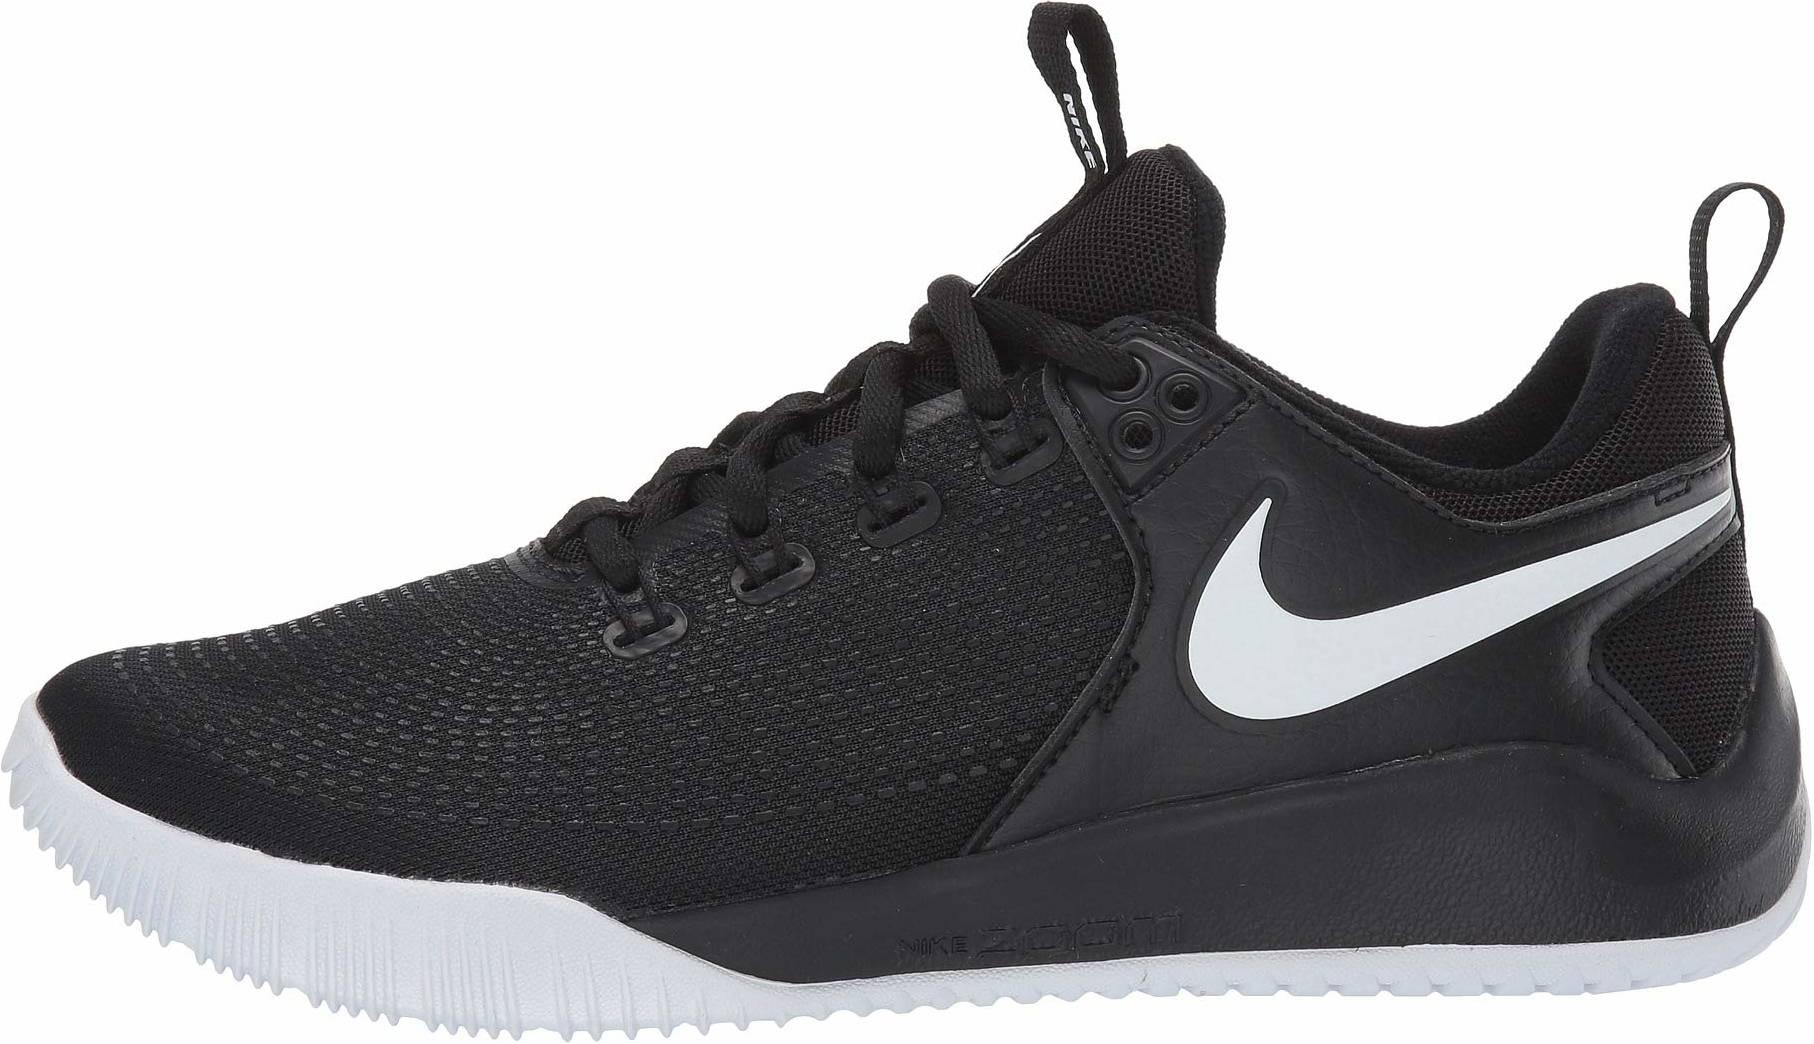 Nike Zoom HyperAce 2